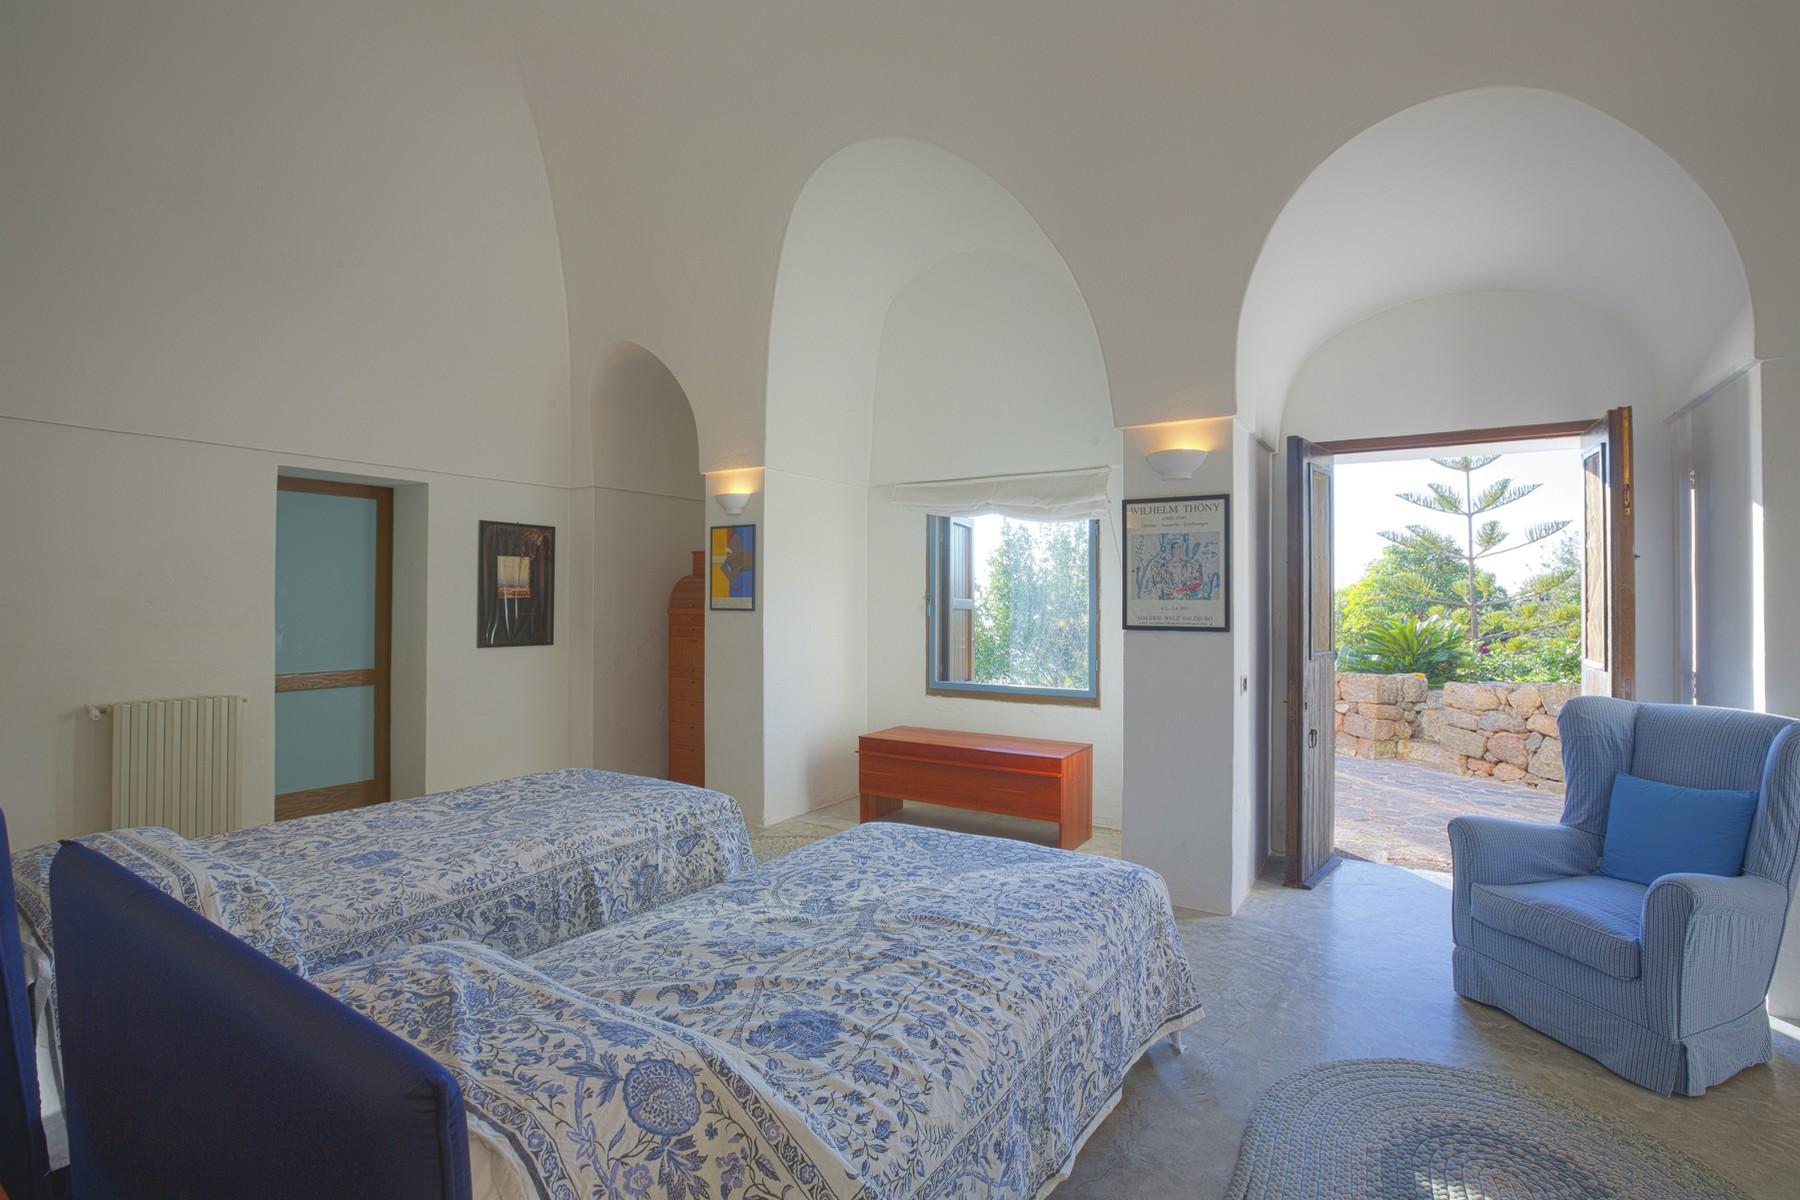 Villa in Vendita a Pantelleria: 5 locali, 530 mq - Foto 19